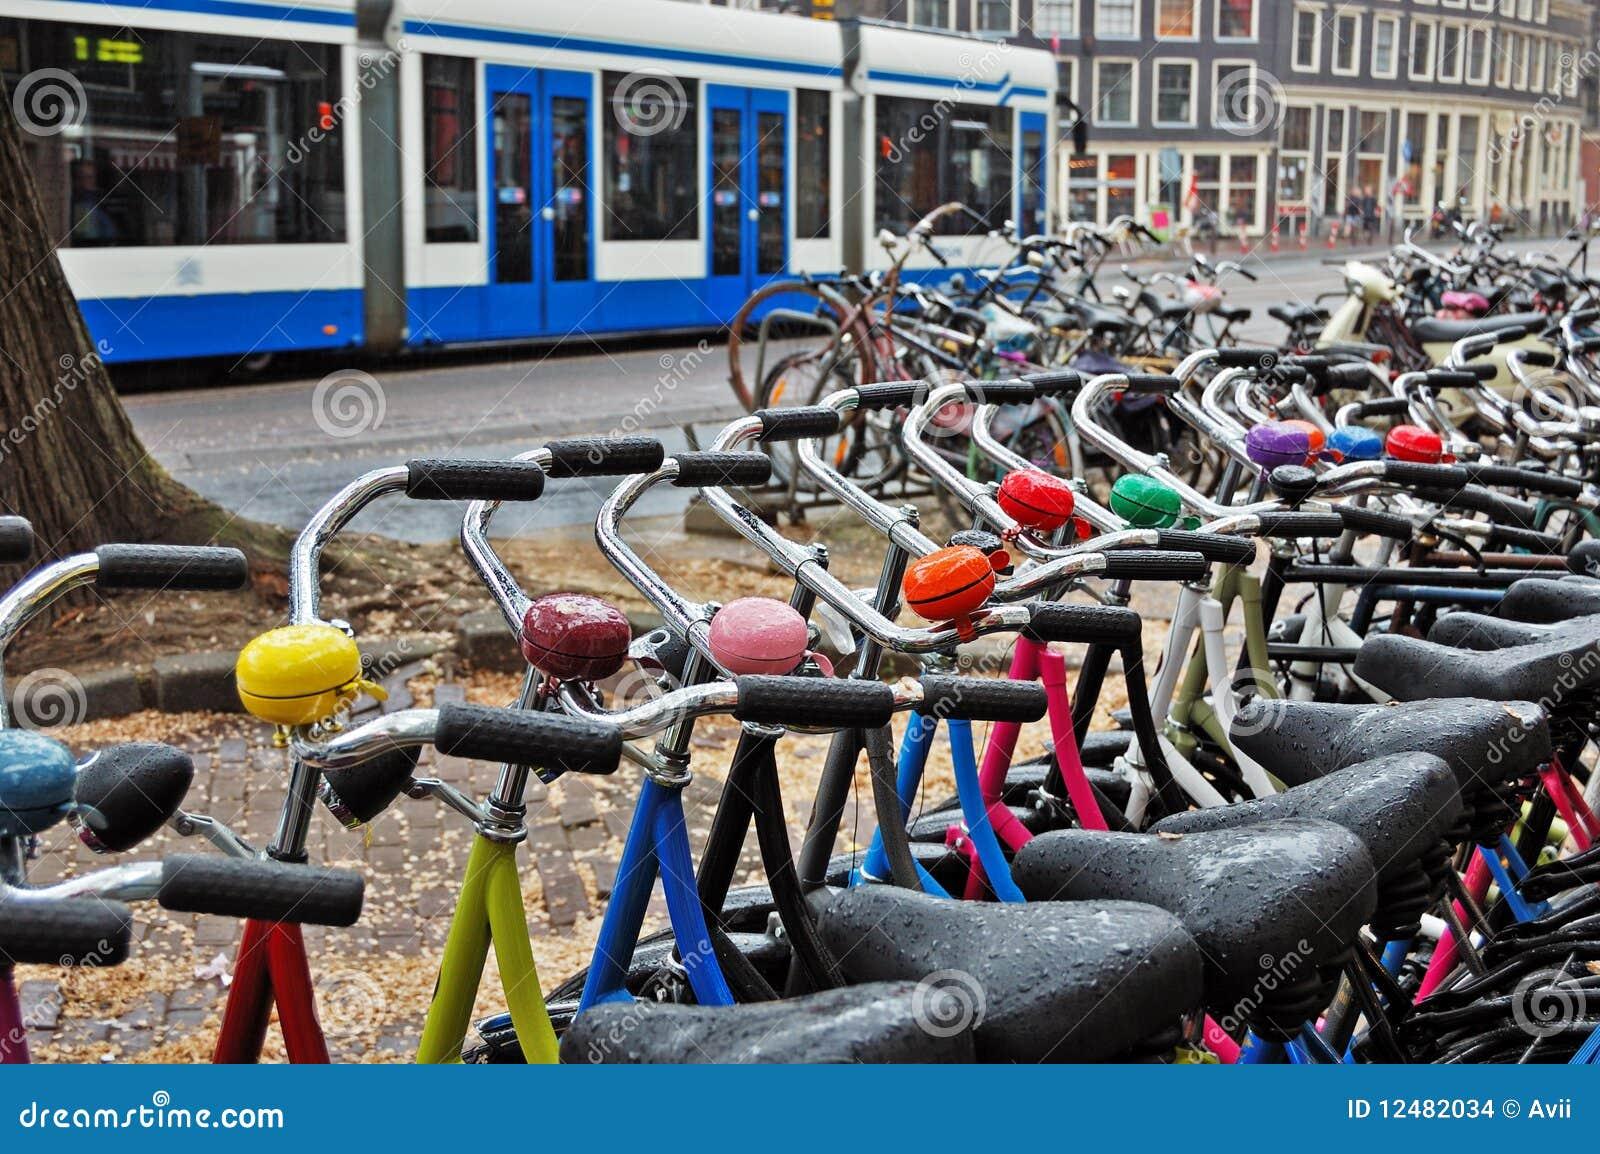 Sample Business Plan: Bob's Rent-A-Bike